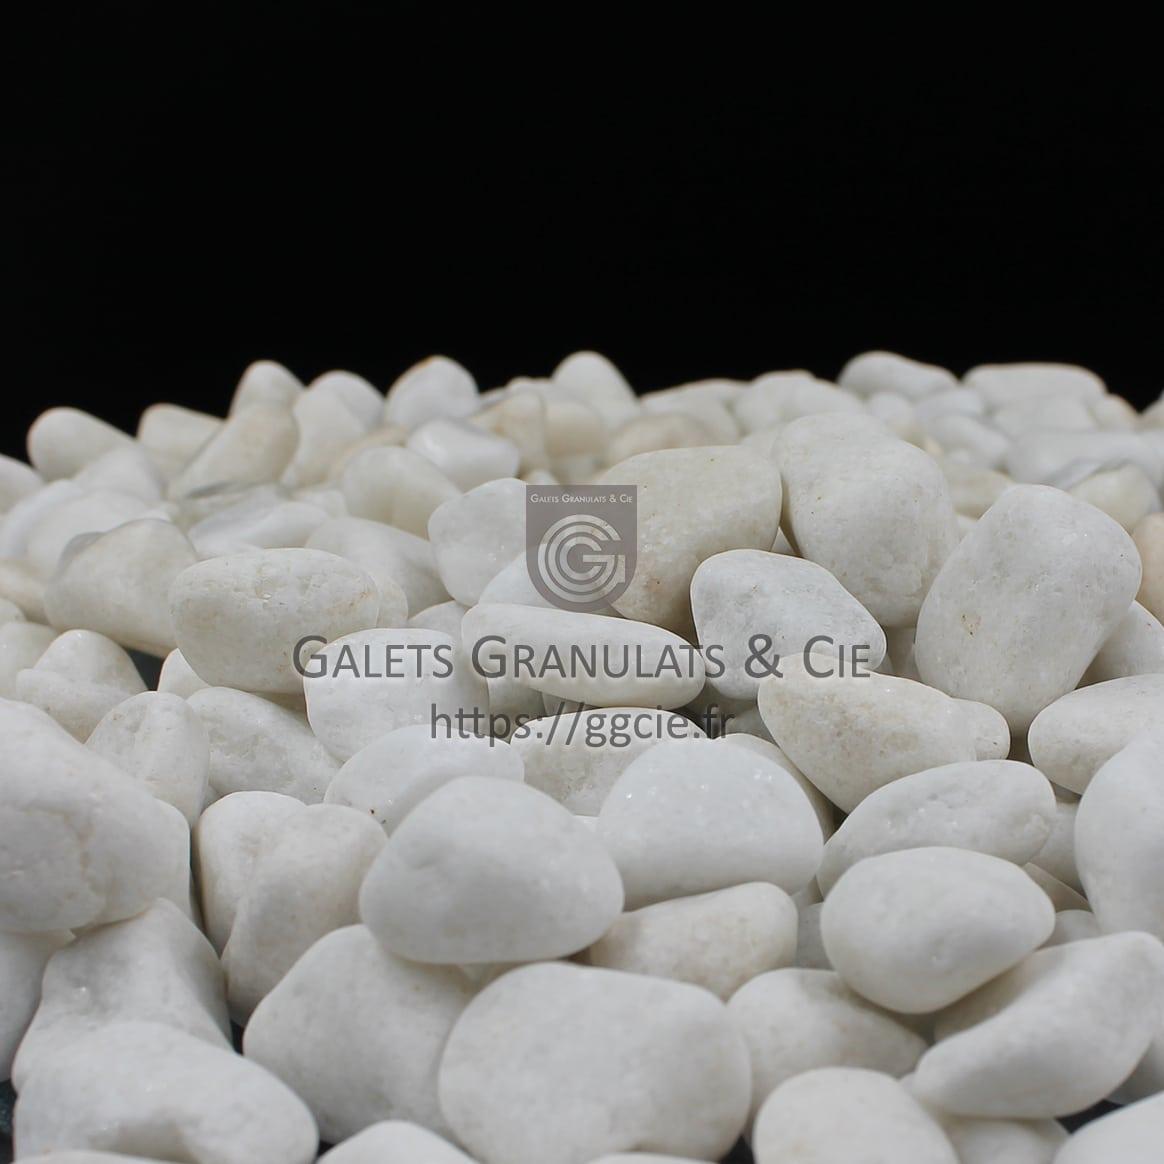 galet marbre blanc paillet galets granulats cie ggc. Black Bedroom Furniture Sets. Home Design Ideas